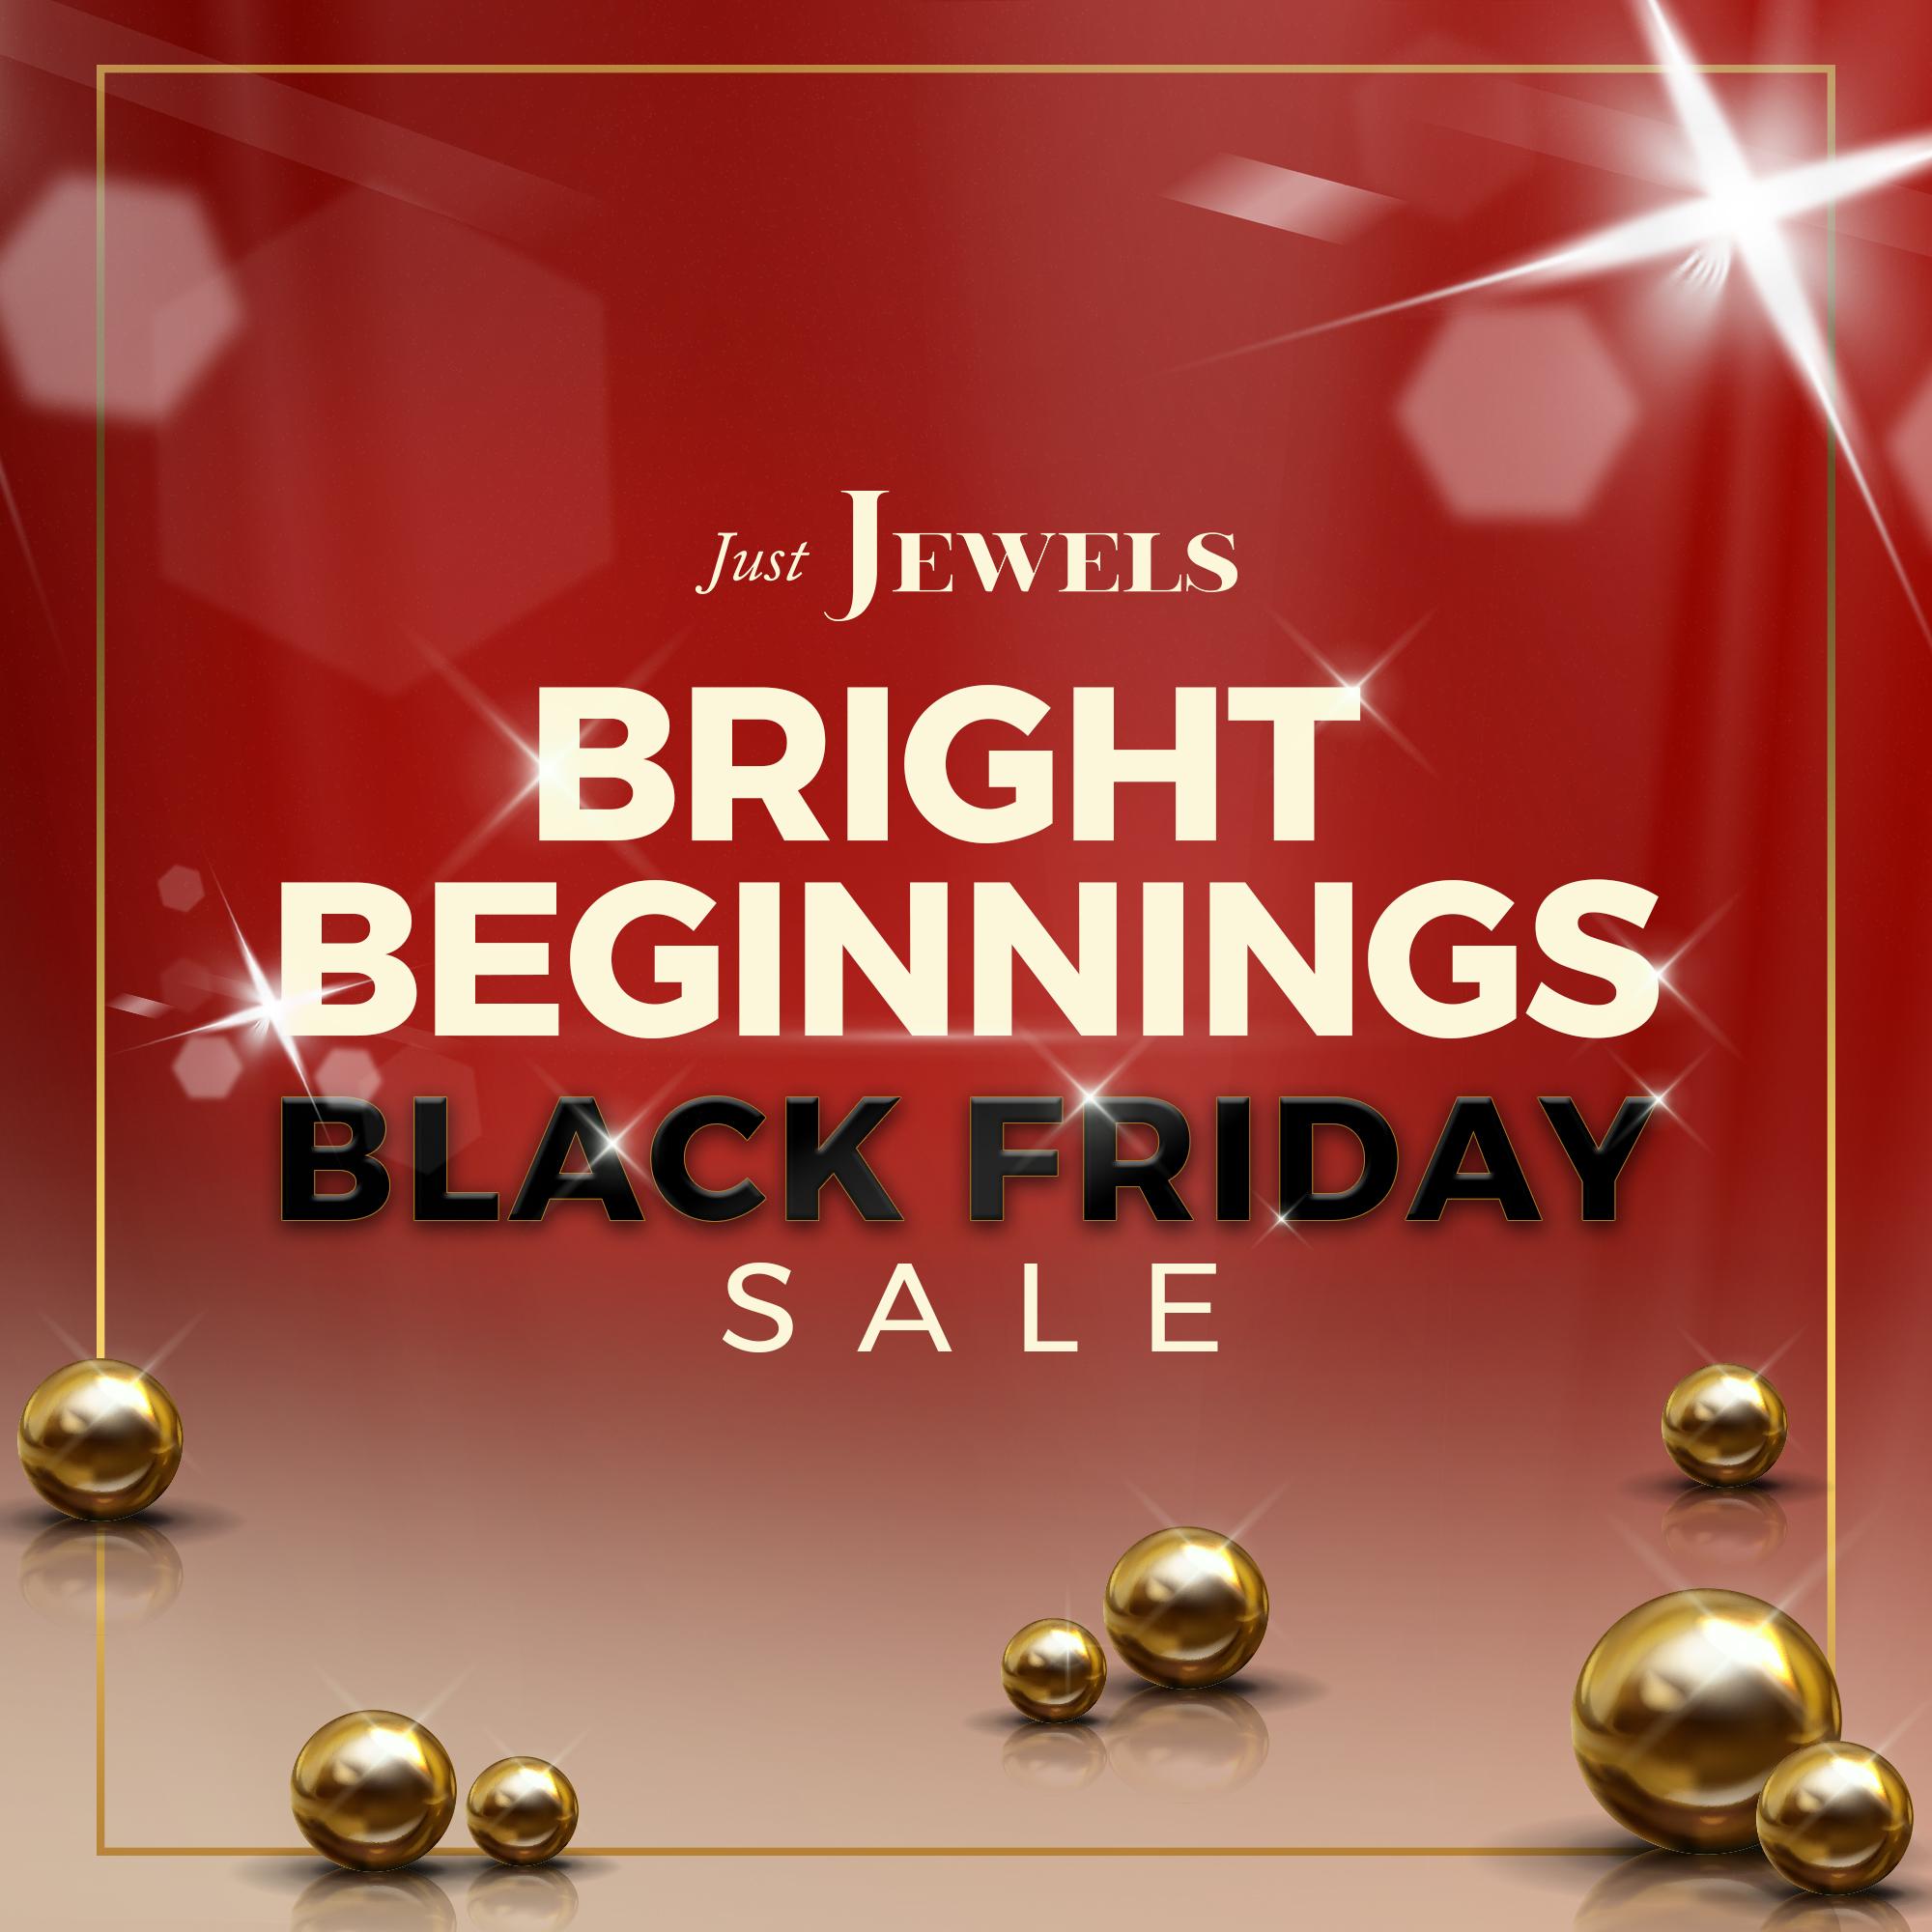 Just Jewels, Black Friday sale, jewelry